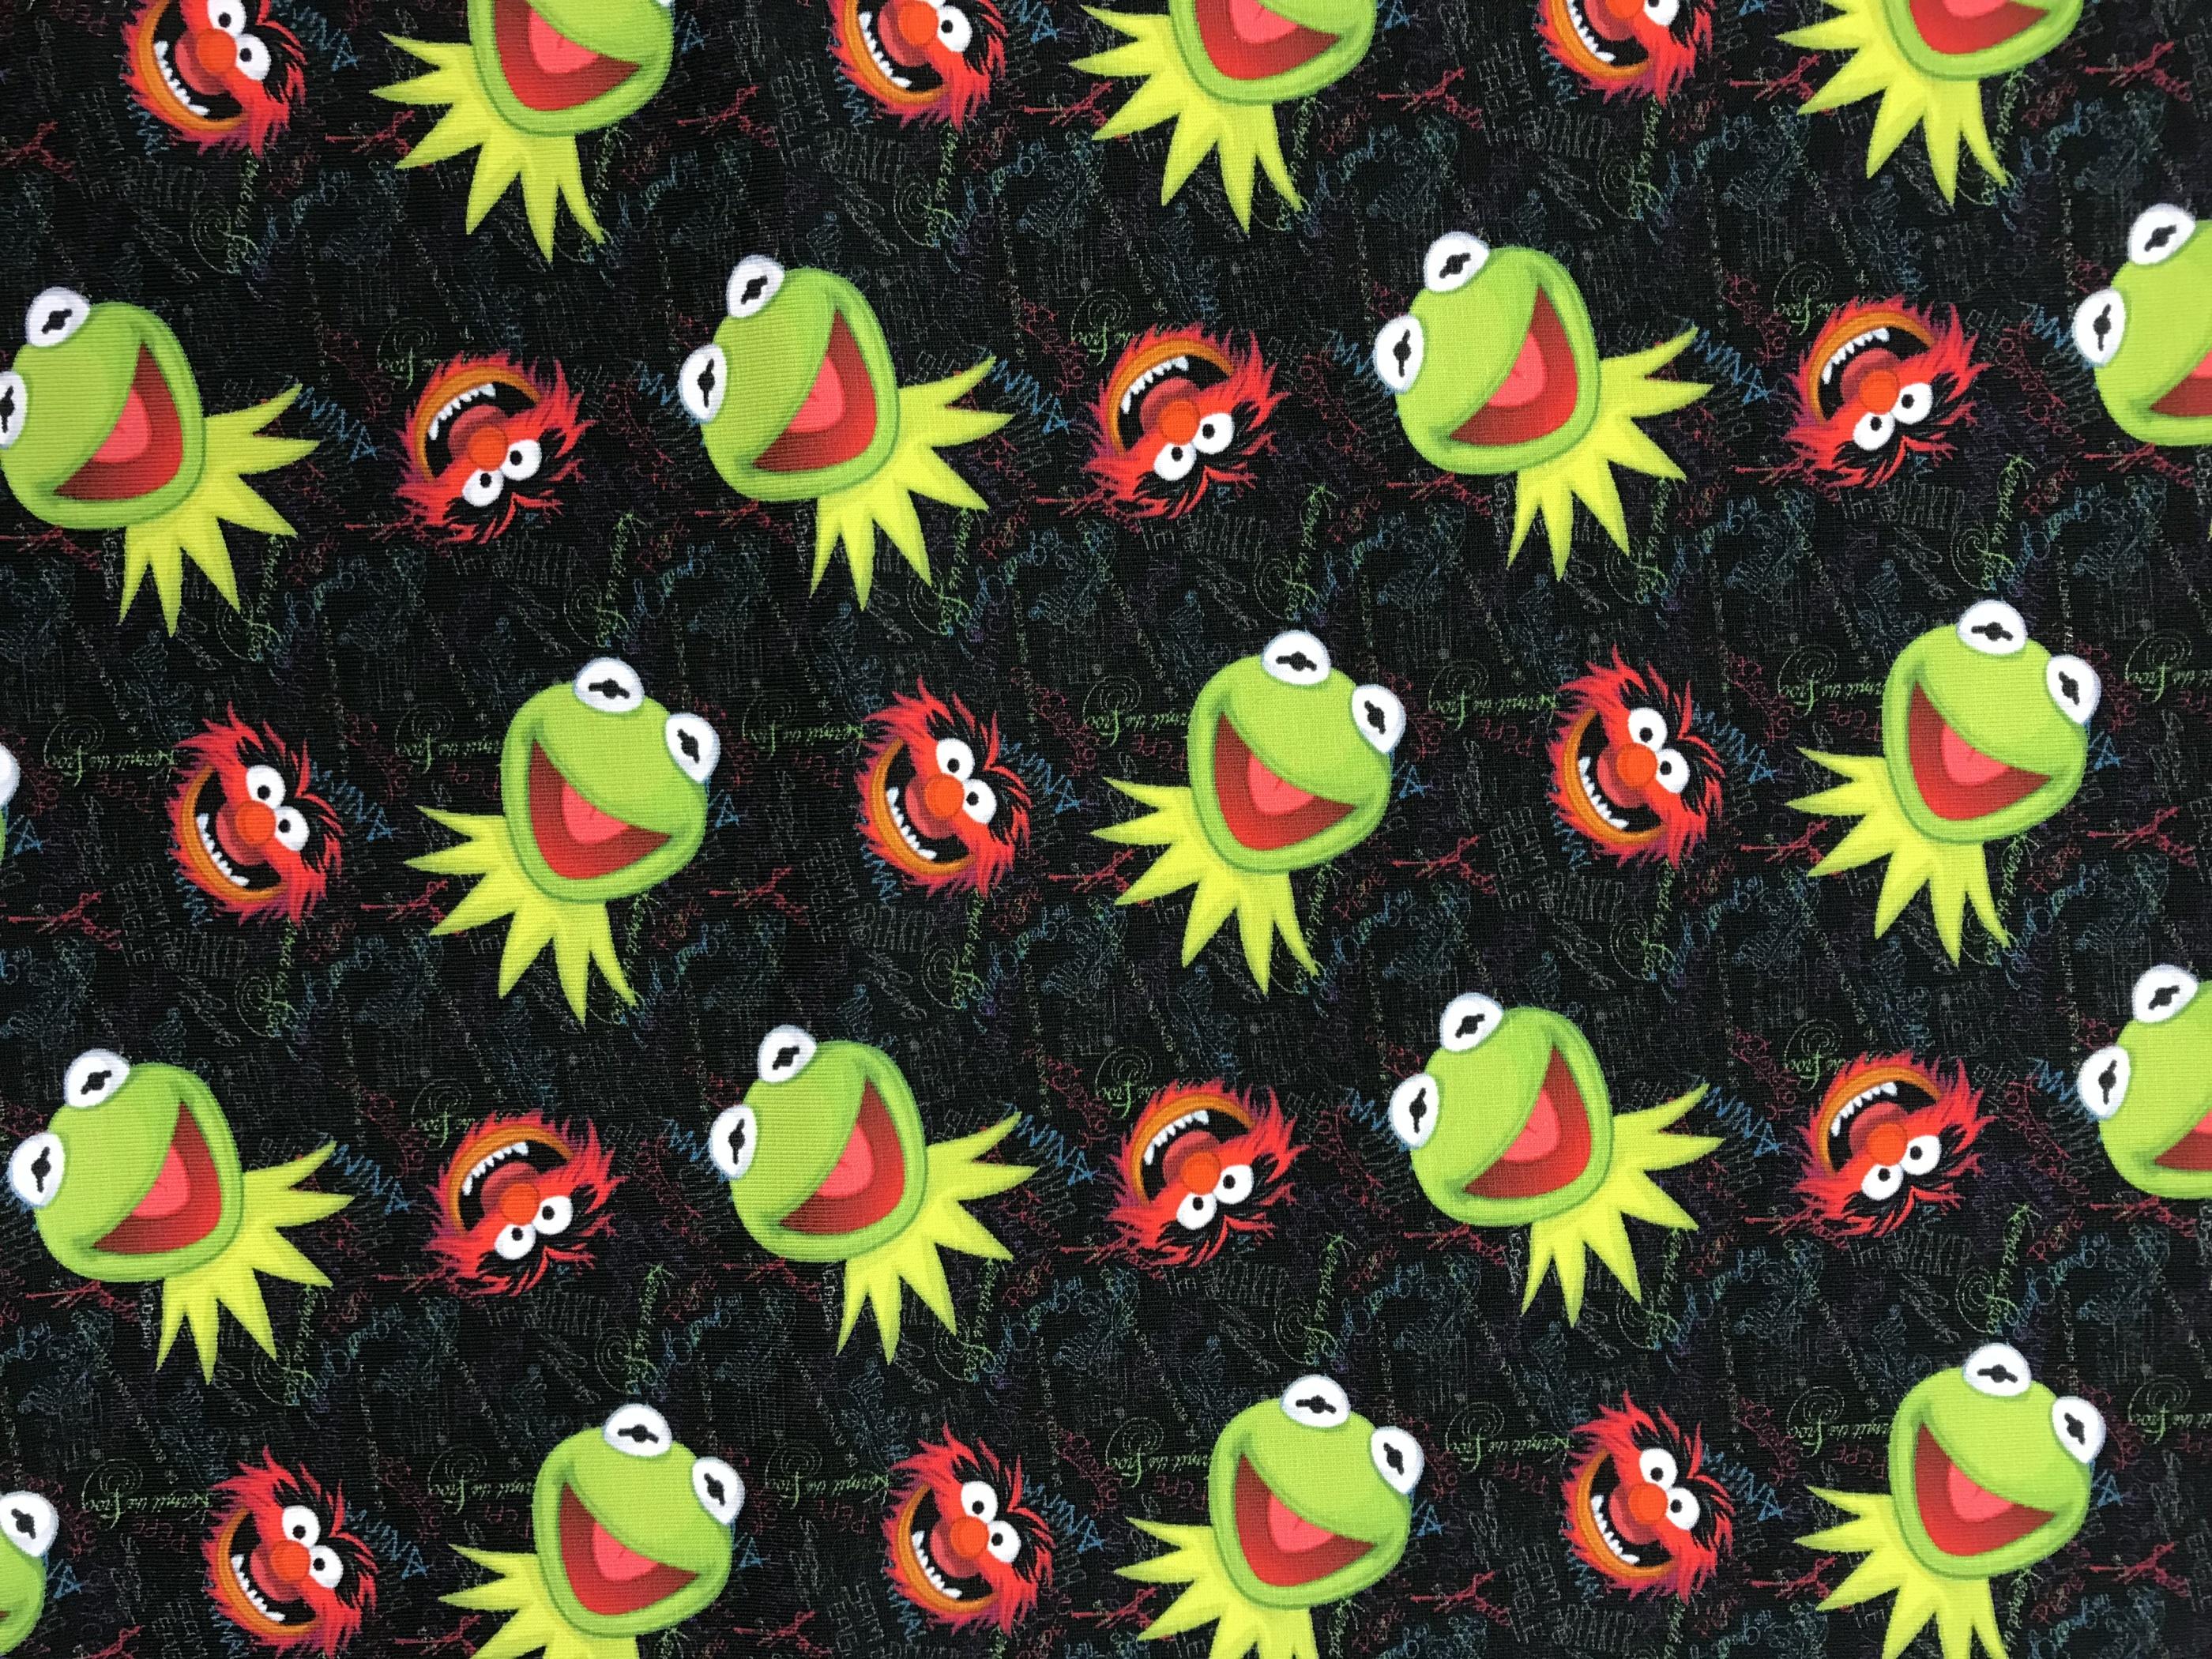 Kermit mupparna bomullstrikå trikå röd grön svart metervara